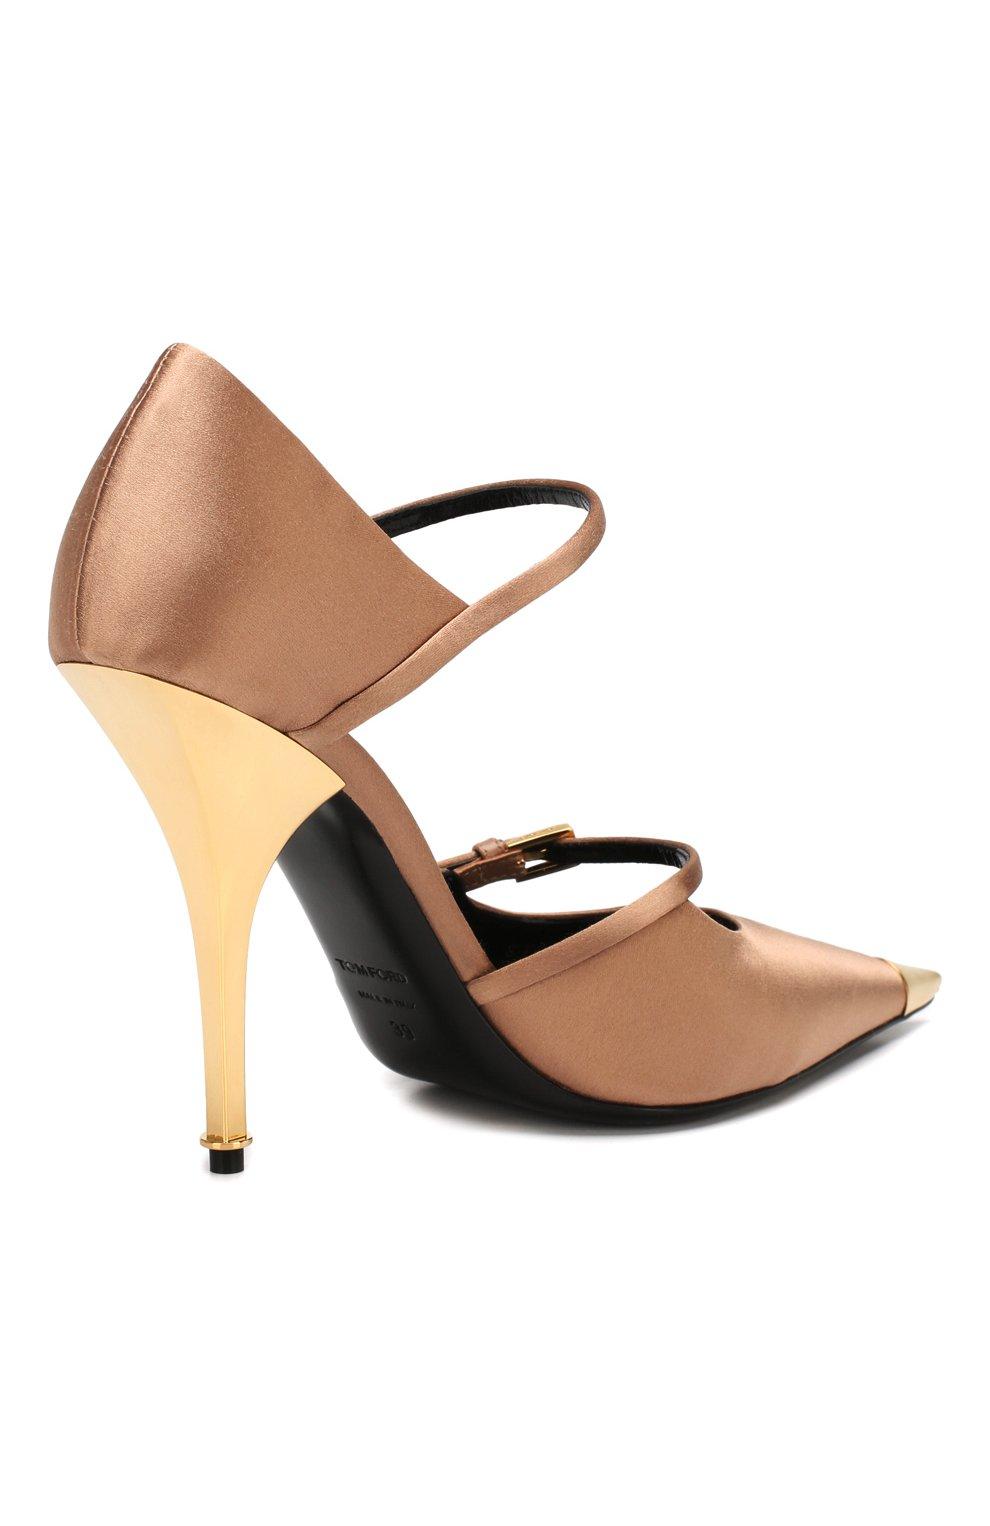 Текстильные туфли Mary Jane Tom Ford бежевые   Фото №4